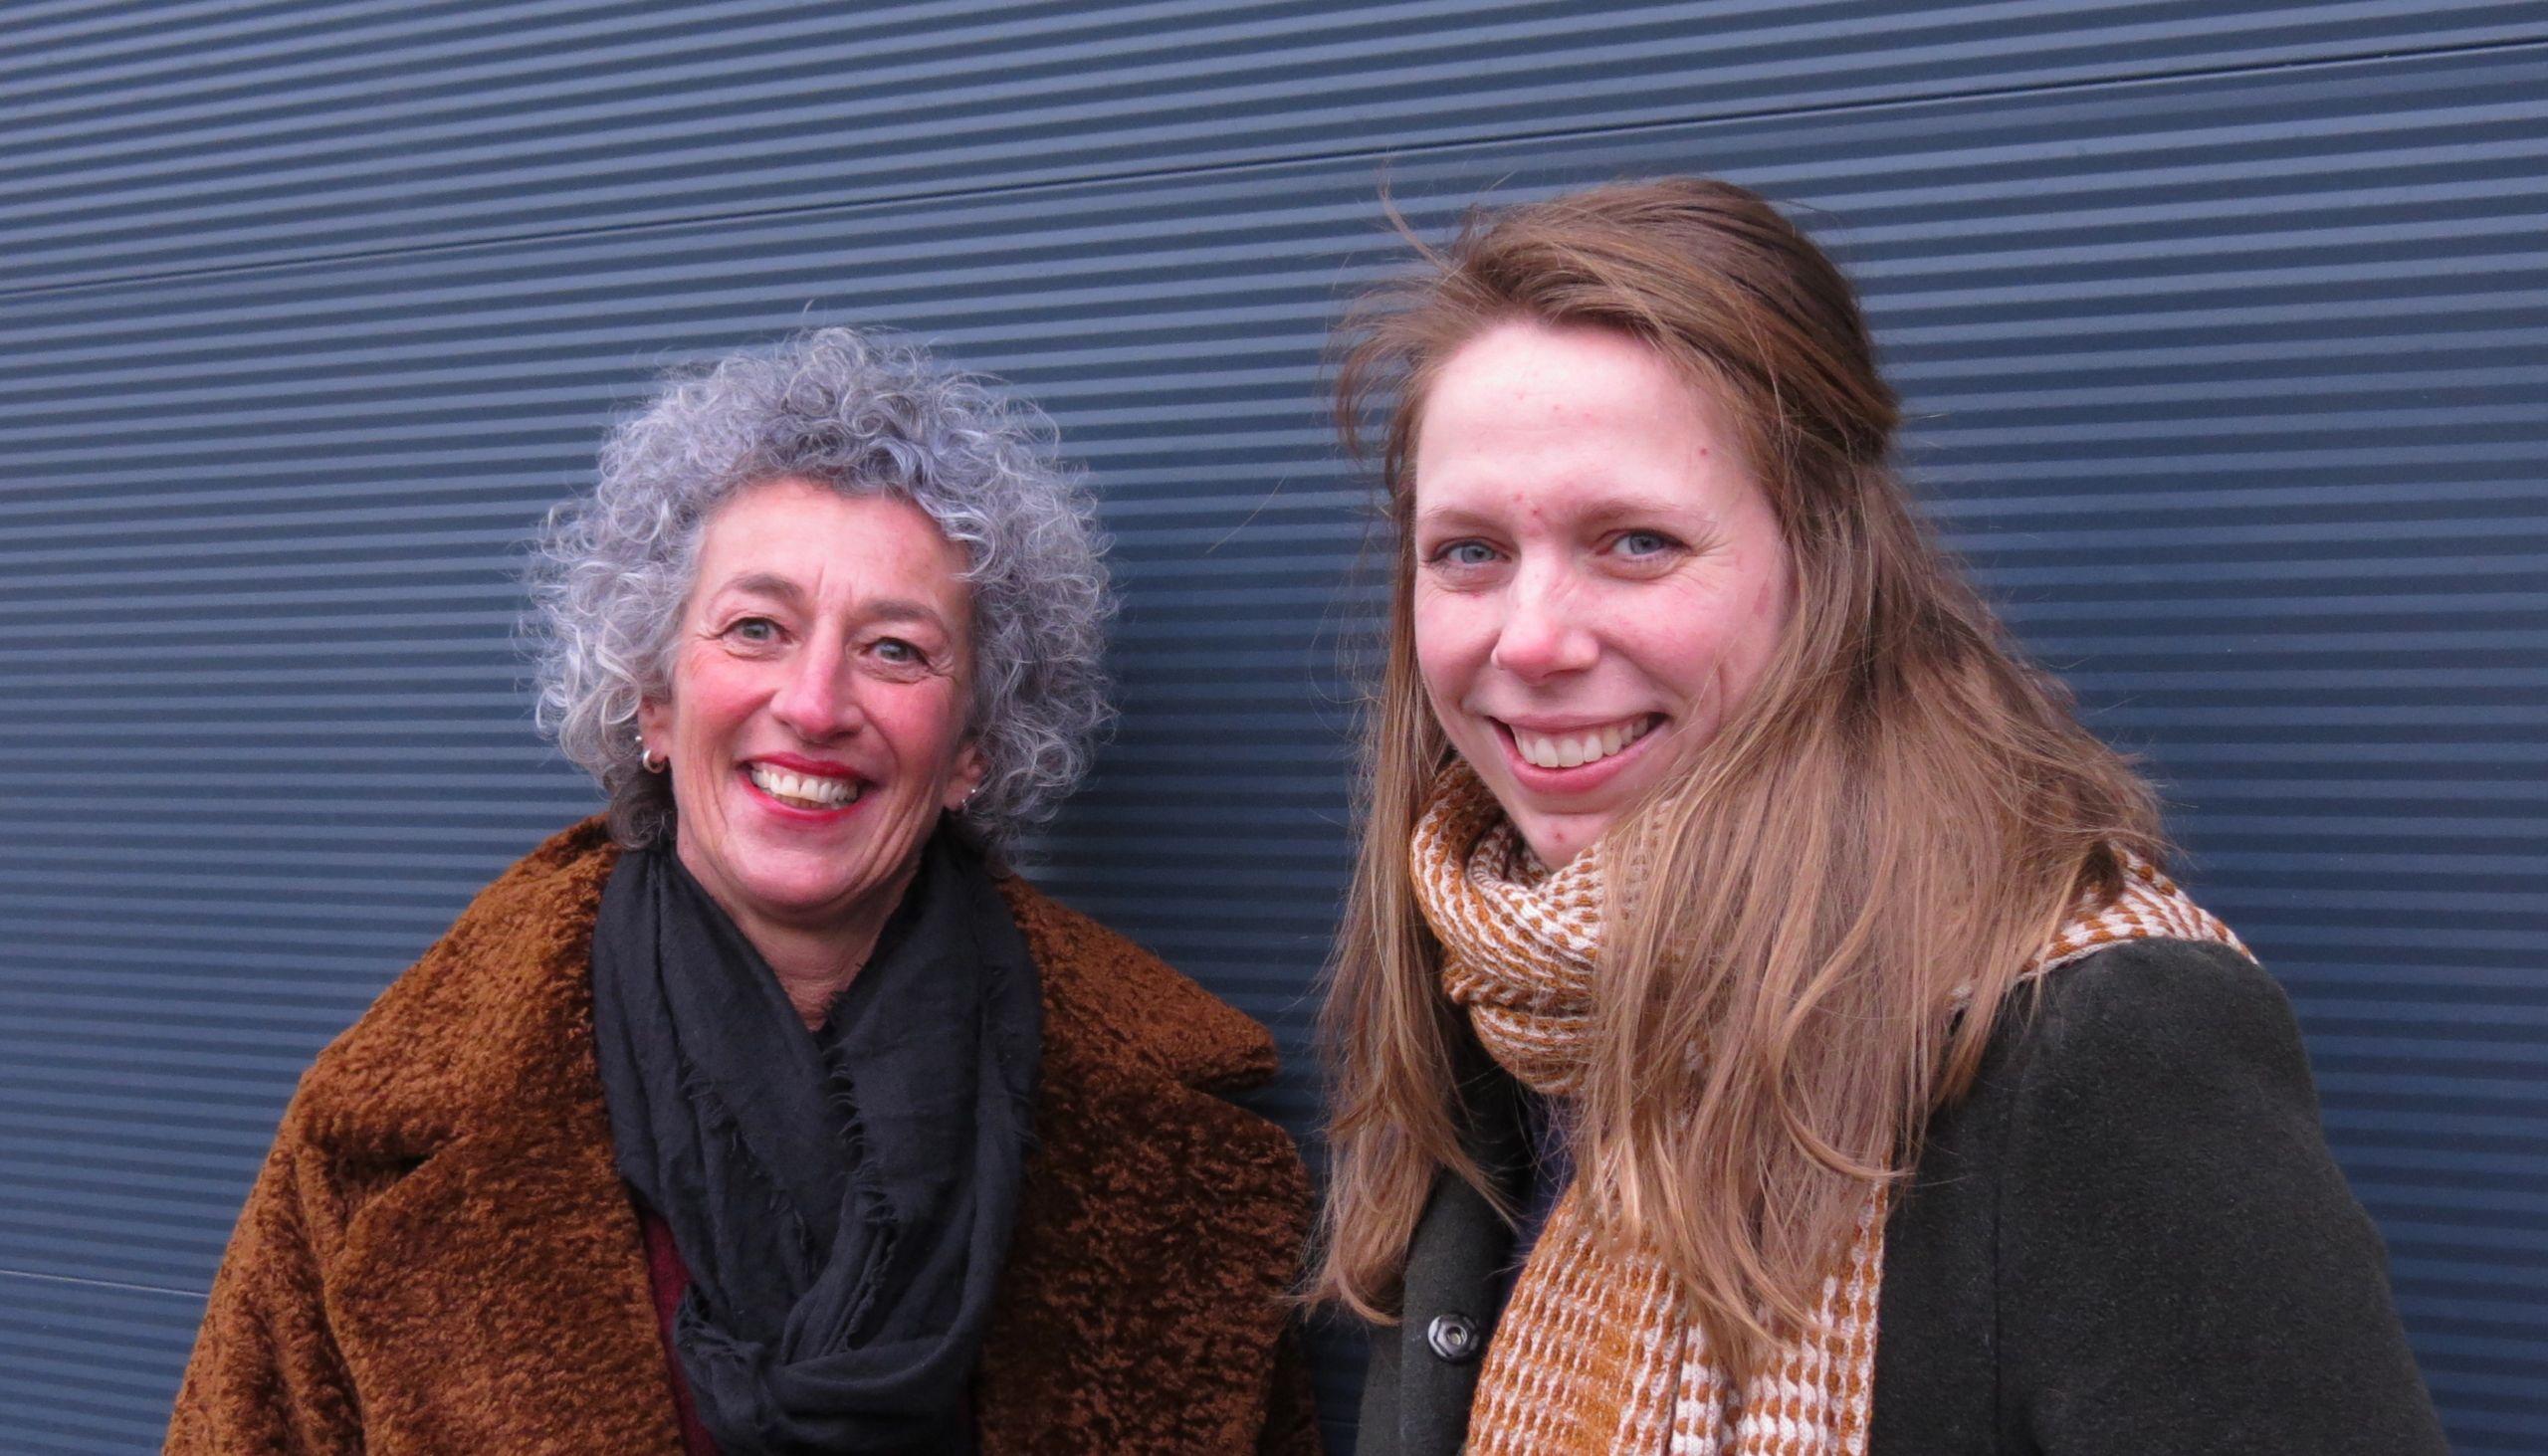 Jolanda-Suzanne-Stichting-Optimale-Ondersteuning-bij-Kanker